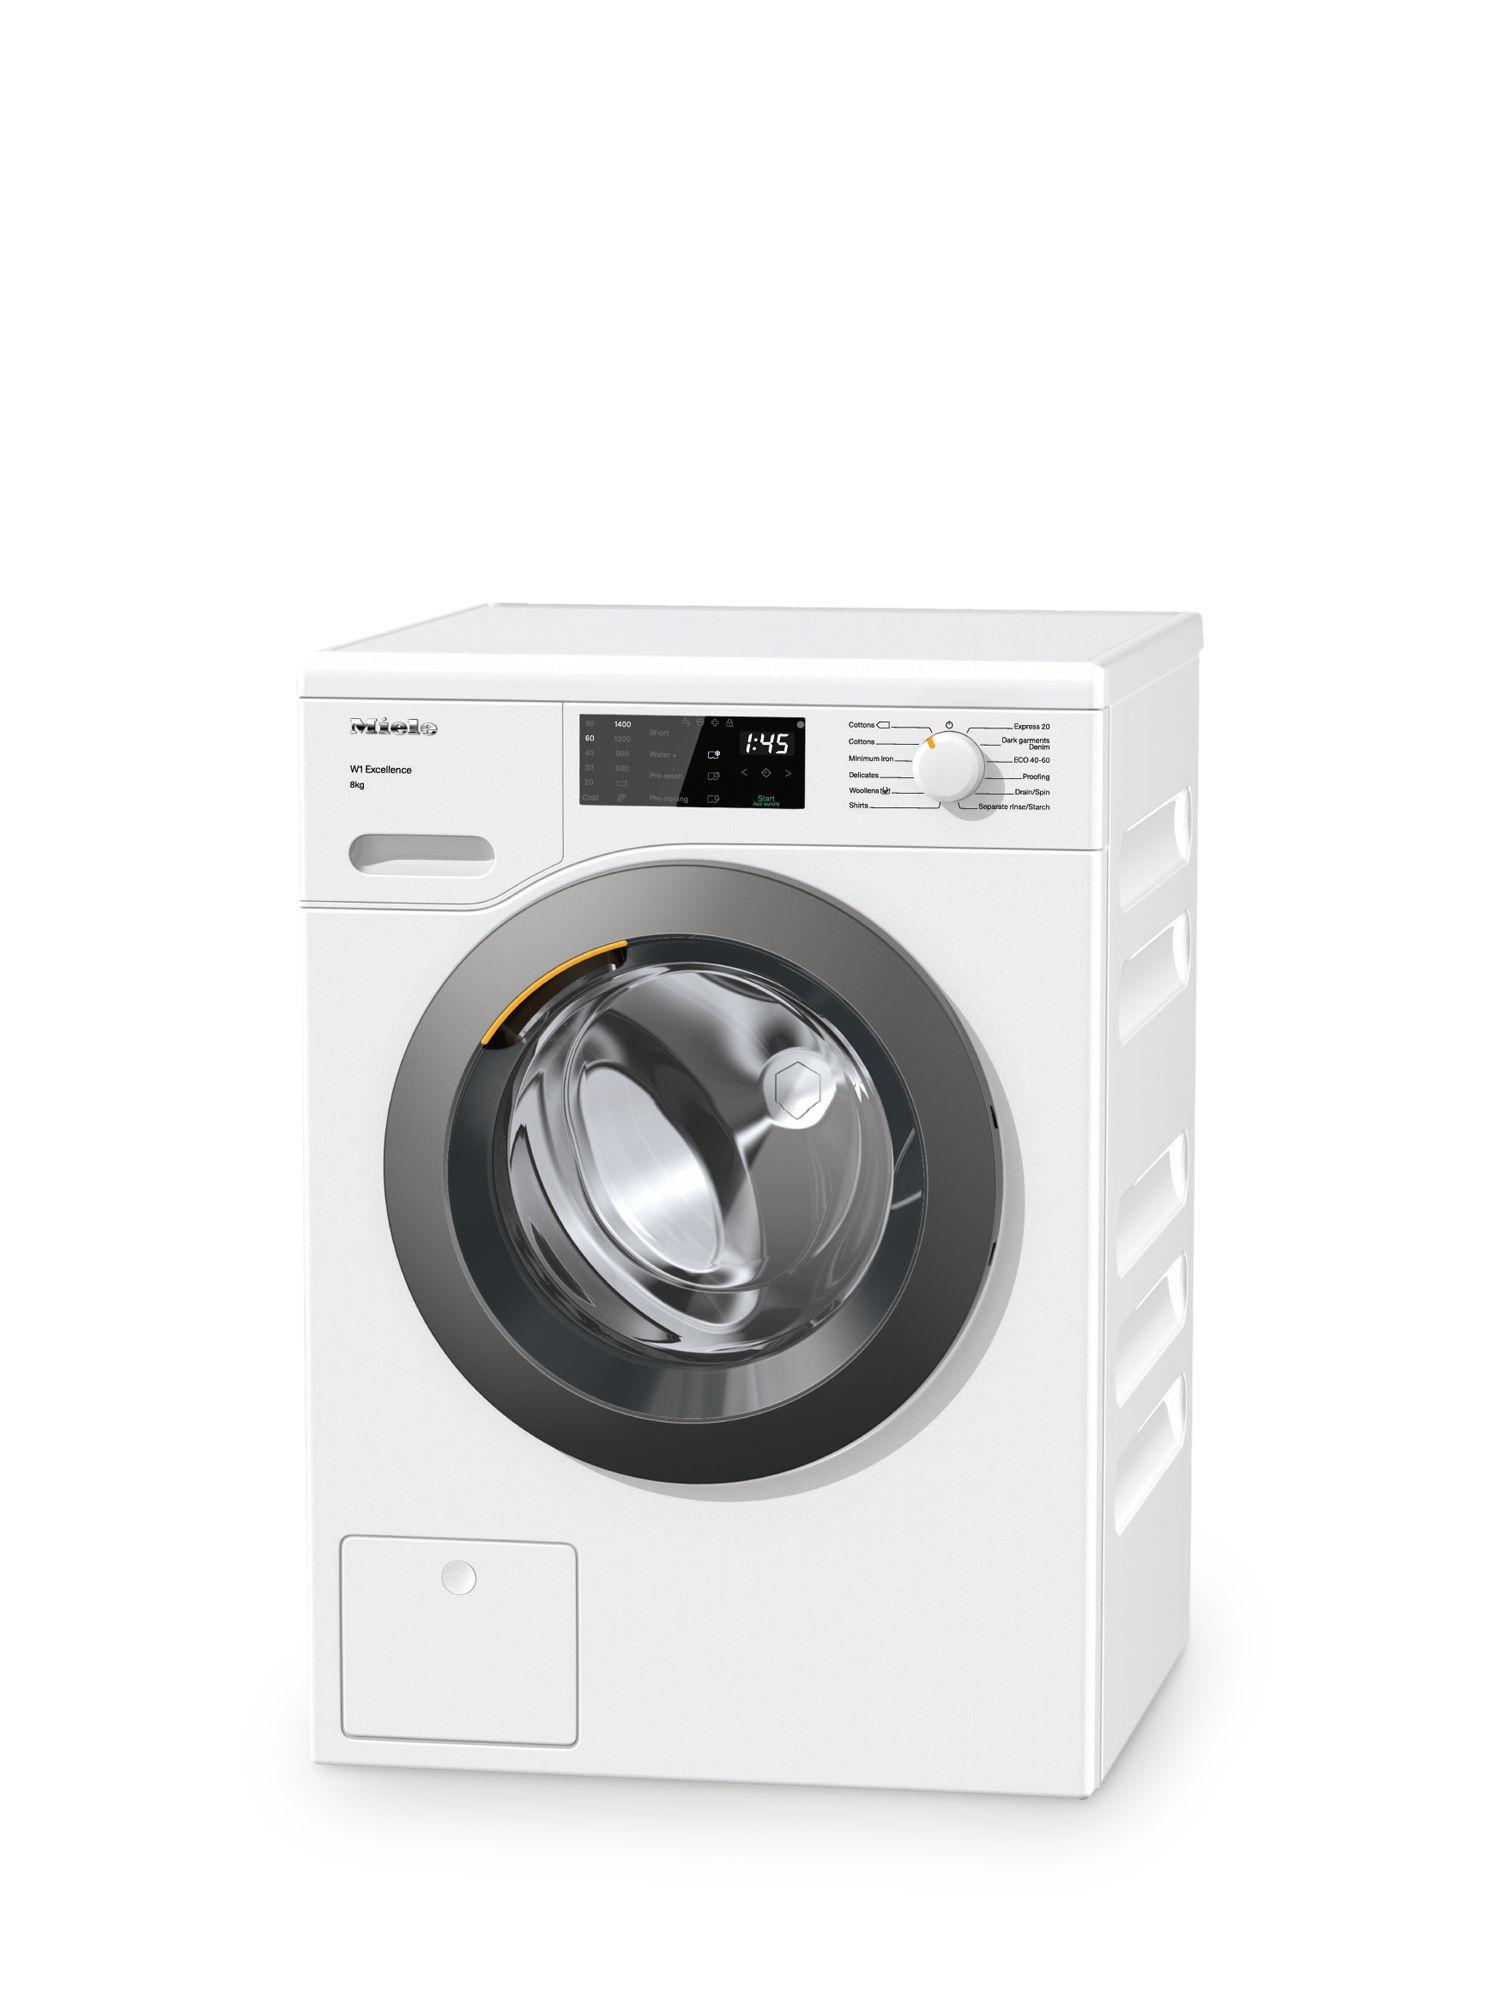 Miele Miele WED125 Washing Machine, 8kg Load, 1400rpm, A+++ Energy Rating, White